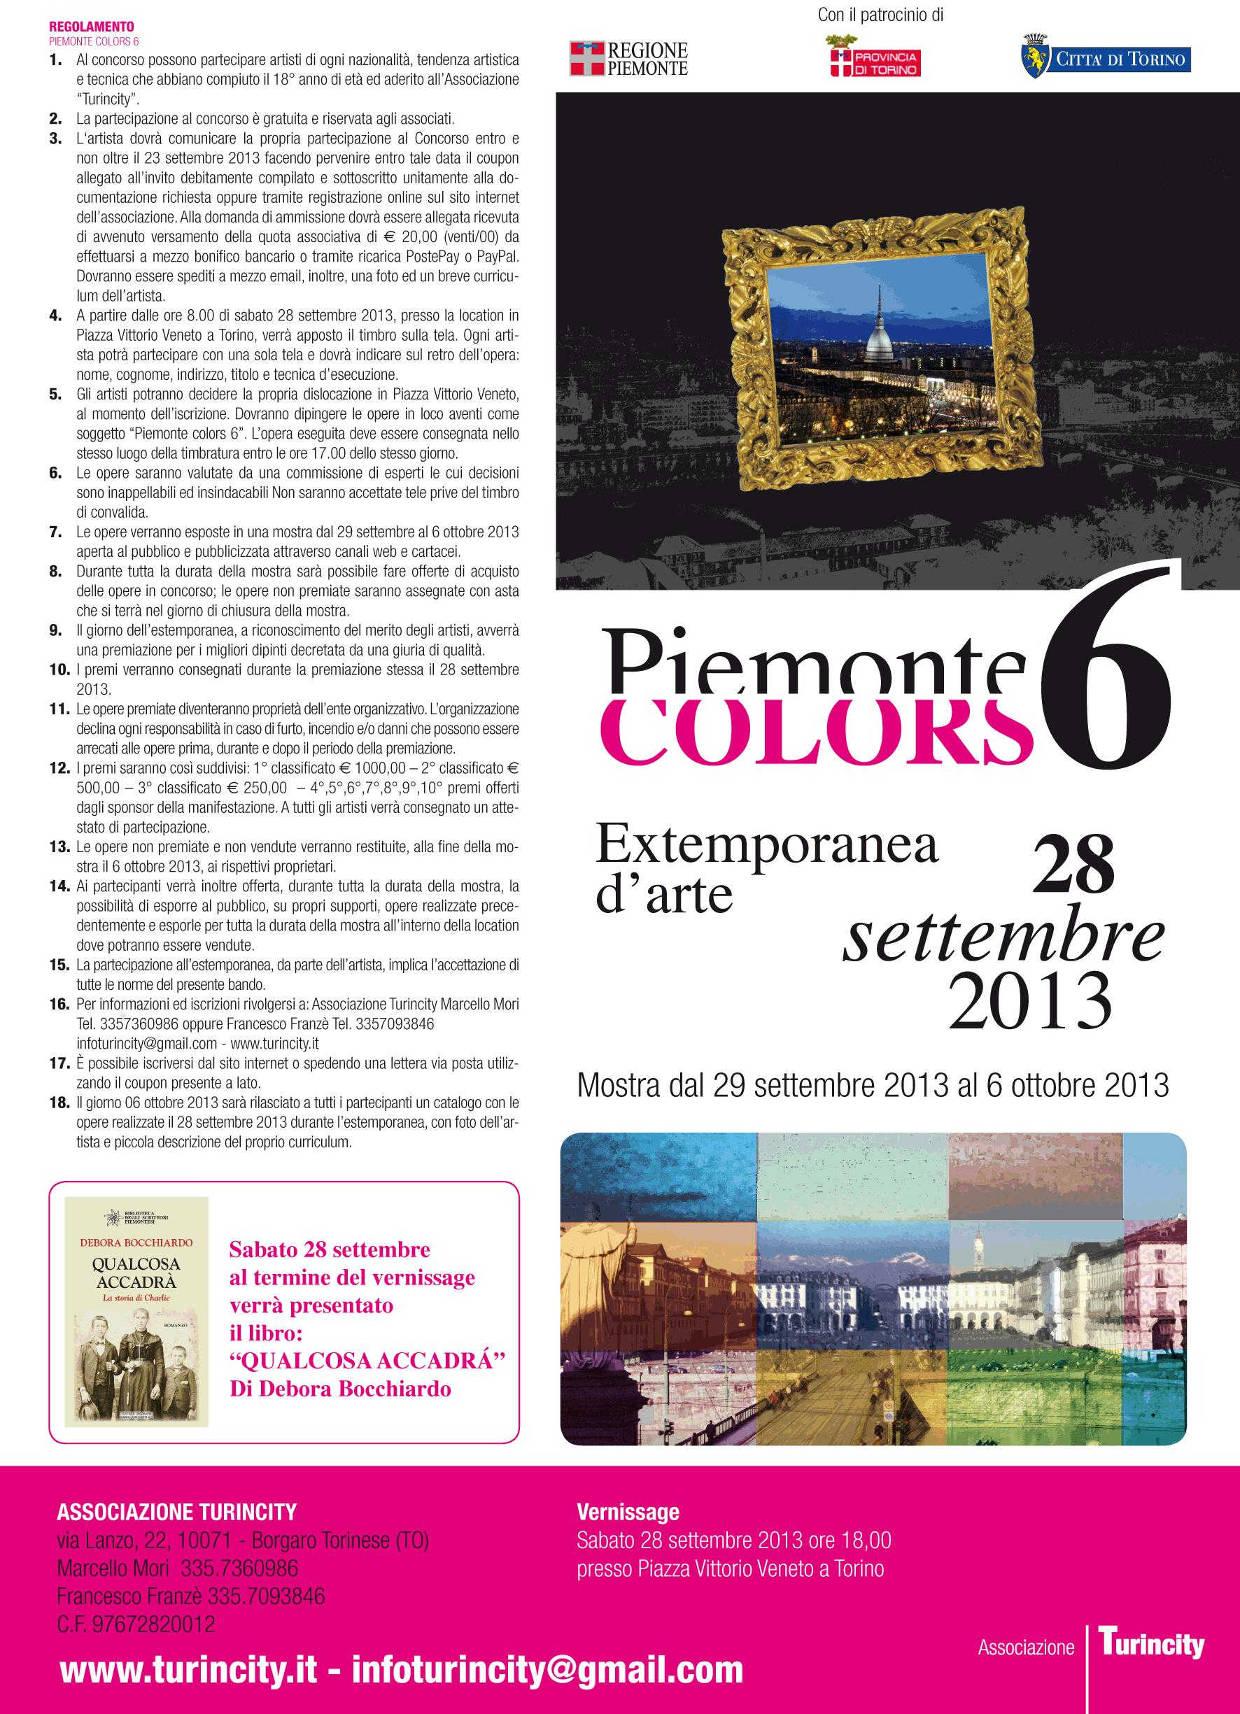 Piemonte colors 6, Estemporanea d'arte il 28 settembre